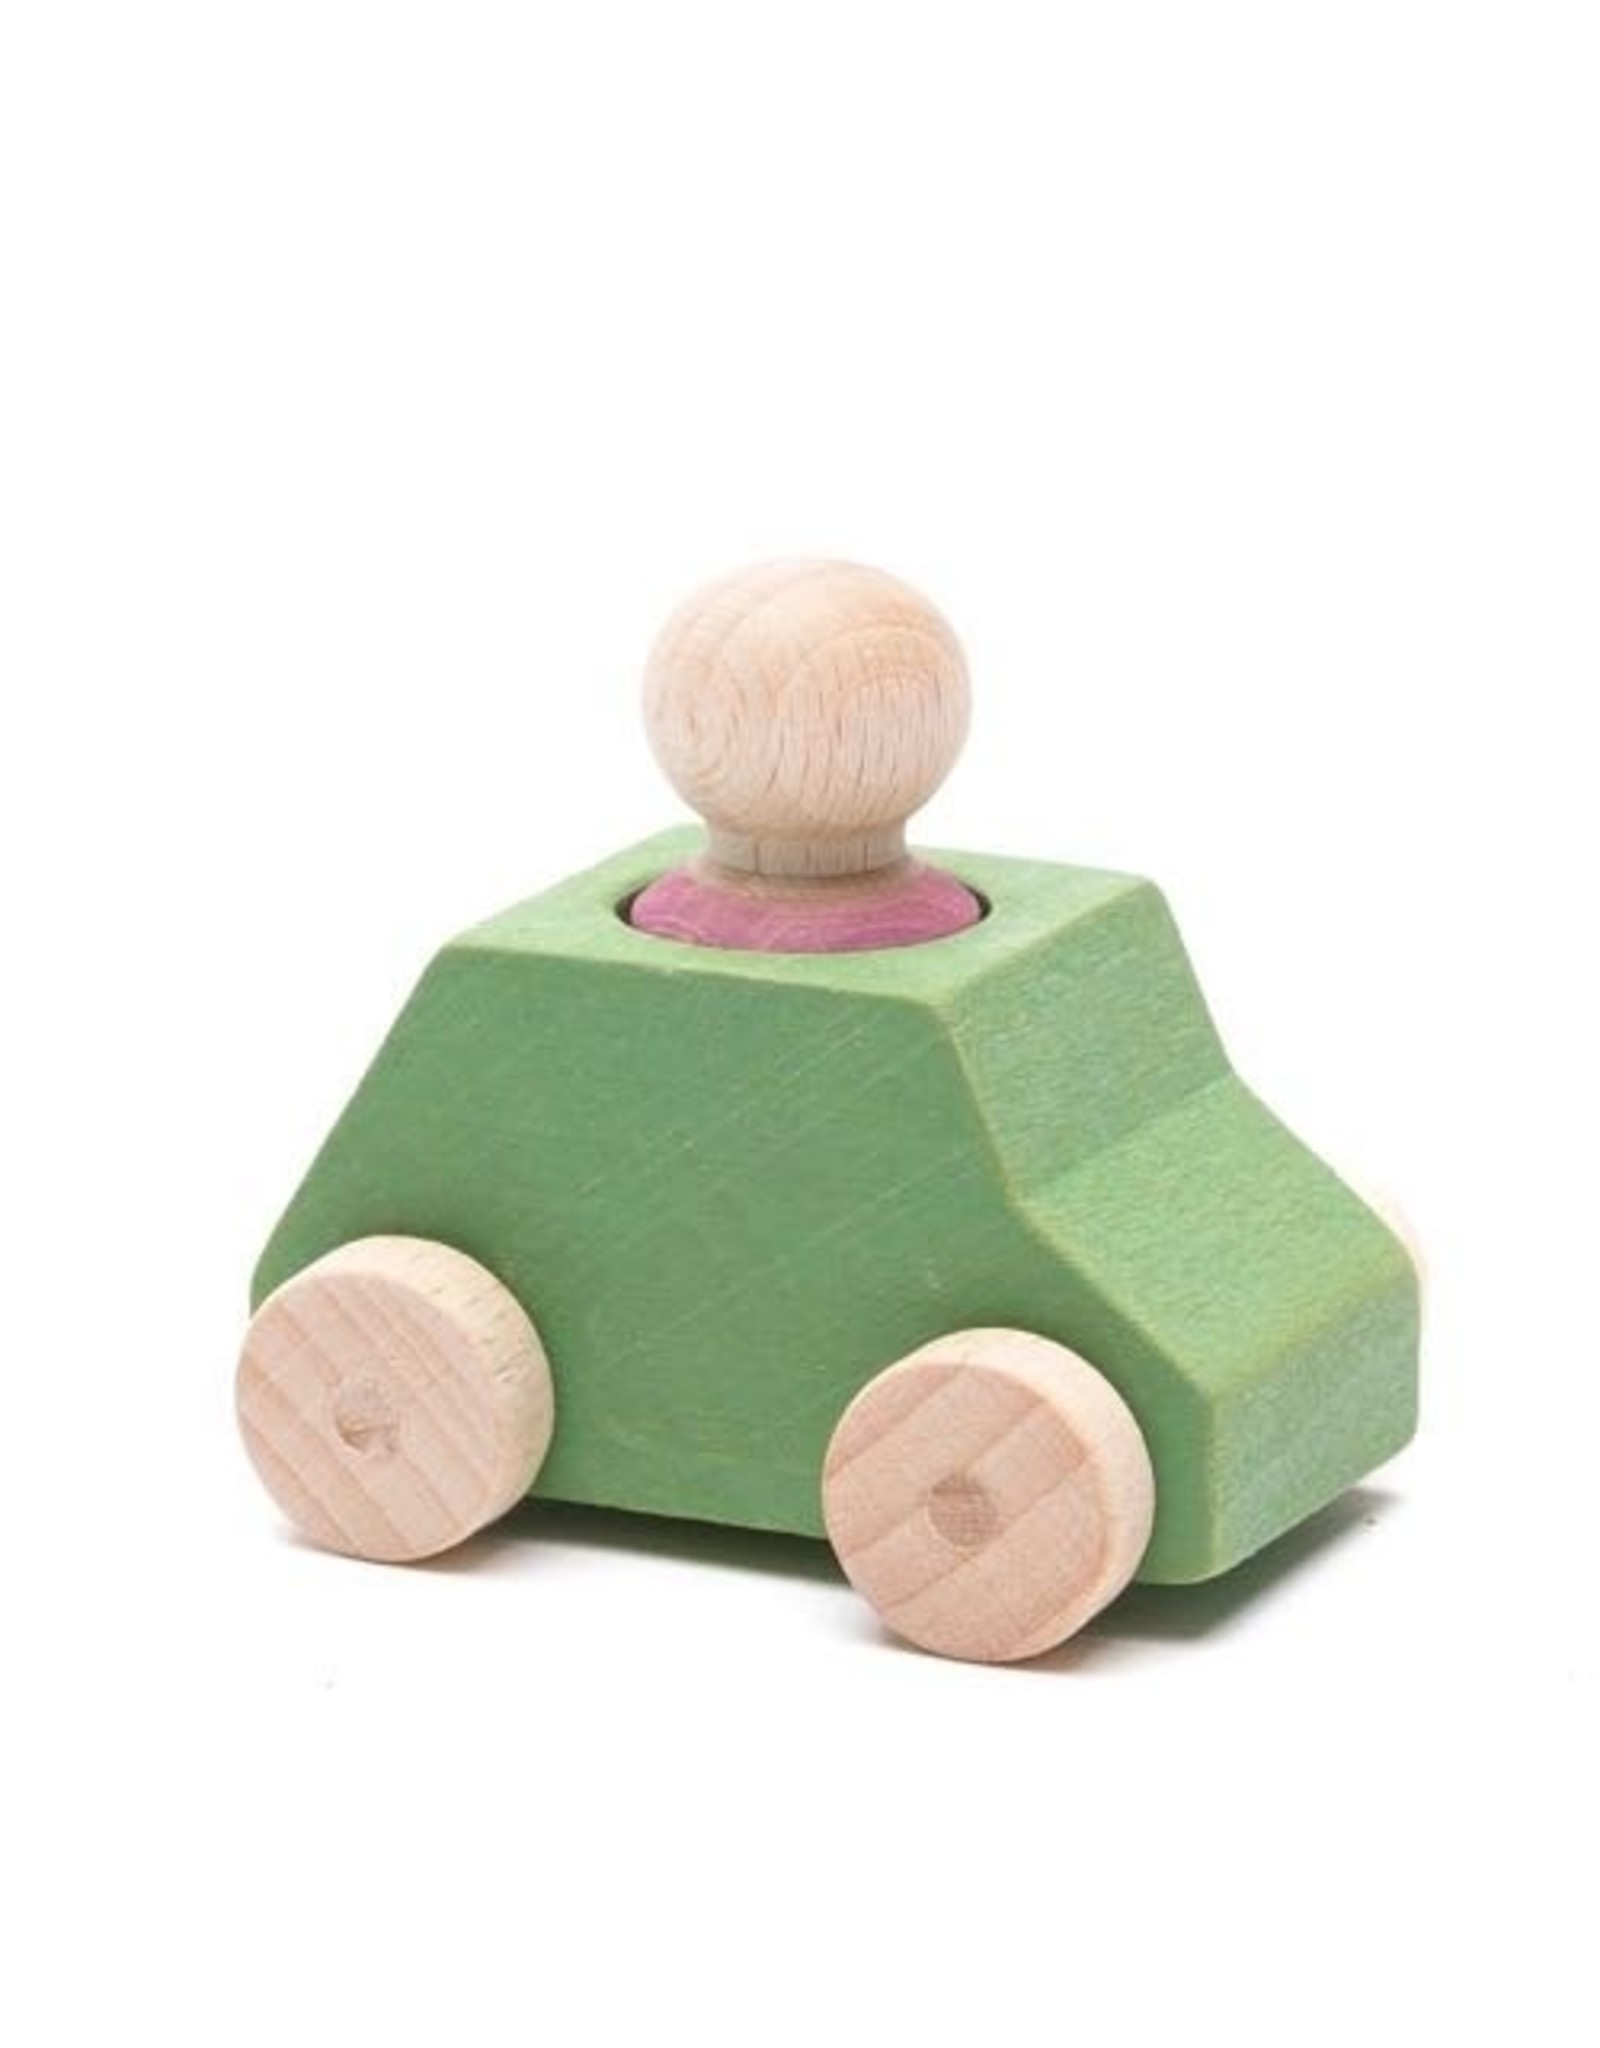 Lubulona  Mint Wooden Toy Car